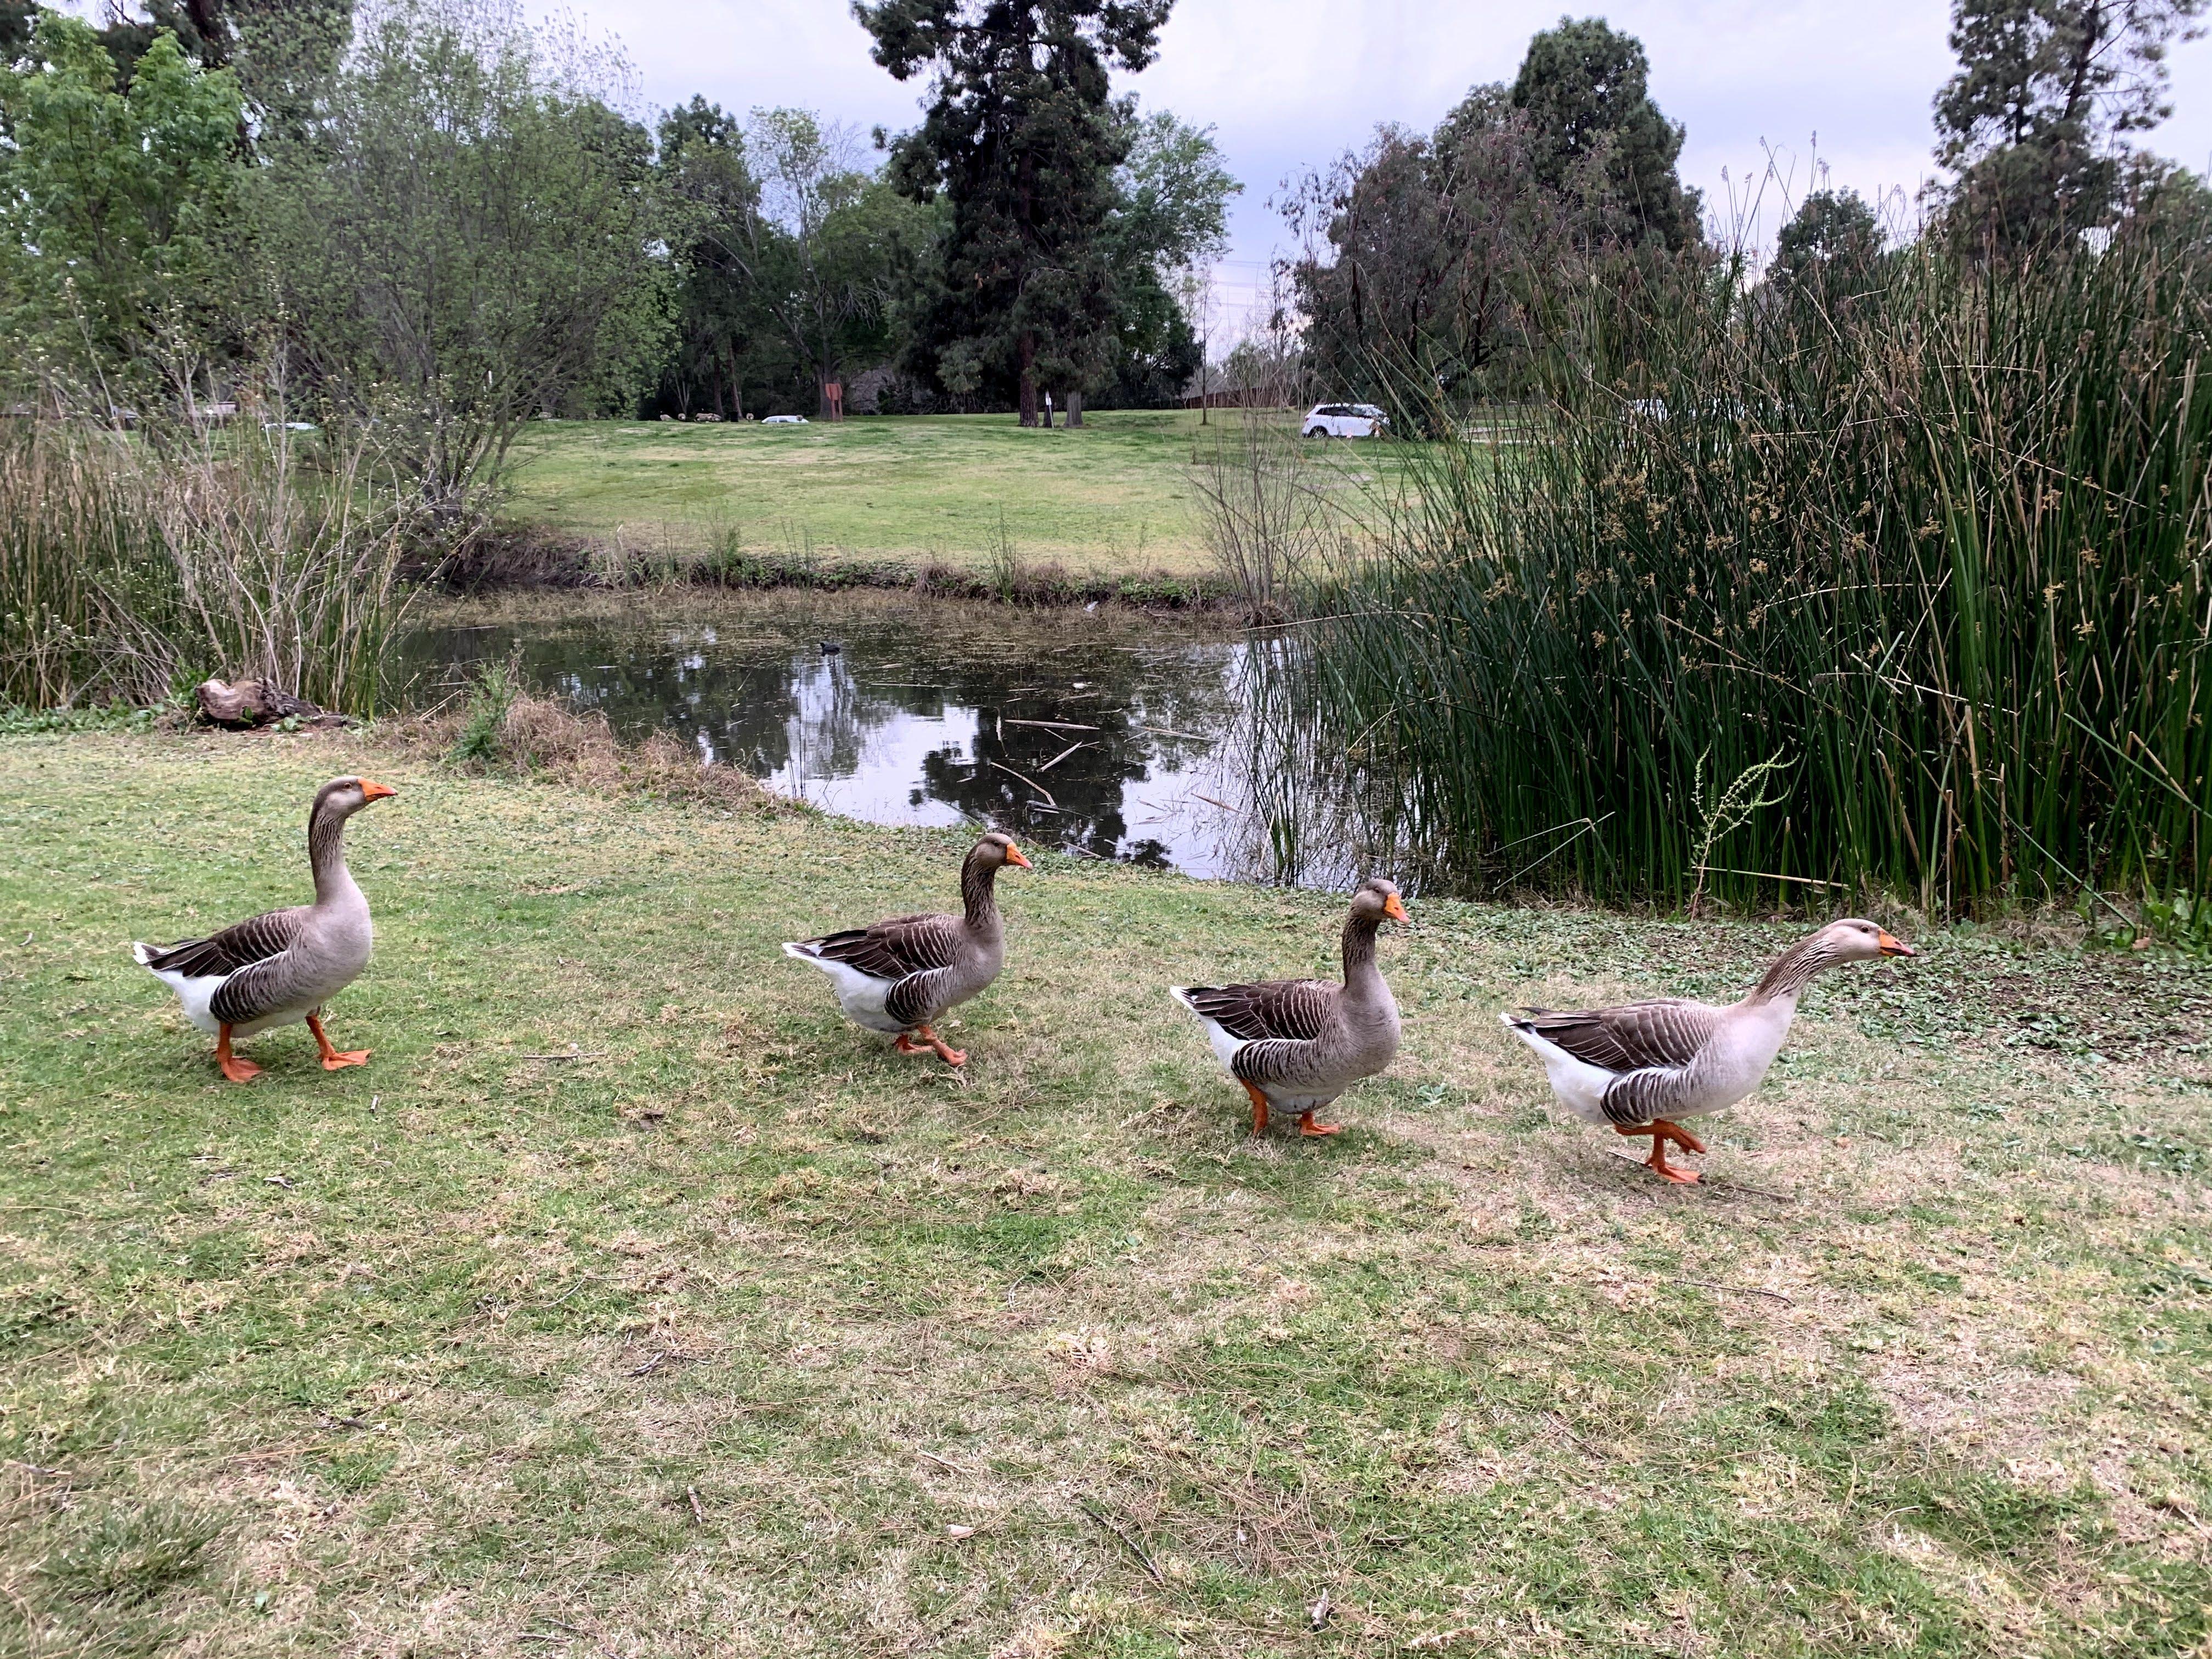 Canada Geese walking in a row beside a lake at El Dorado Regional Park in east Long Beach Los Angeles County